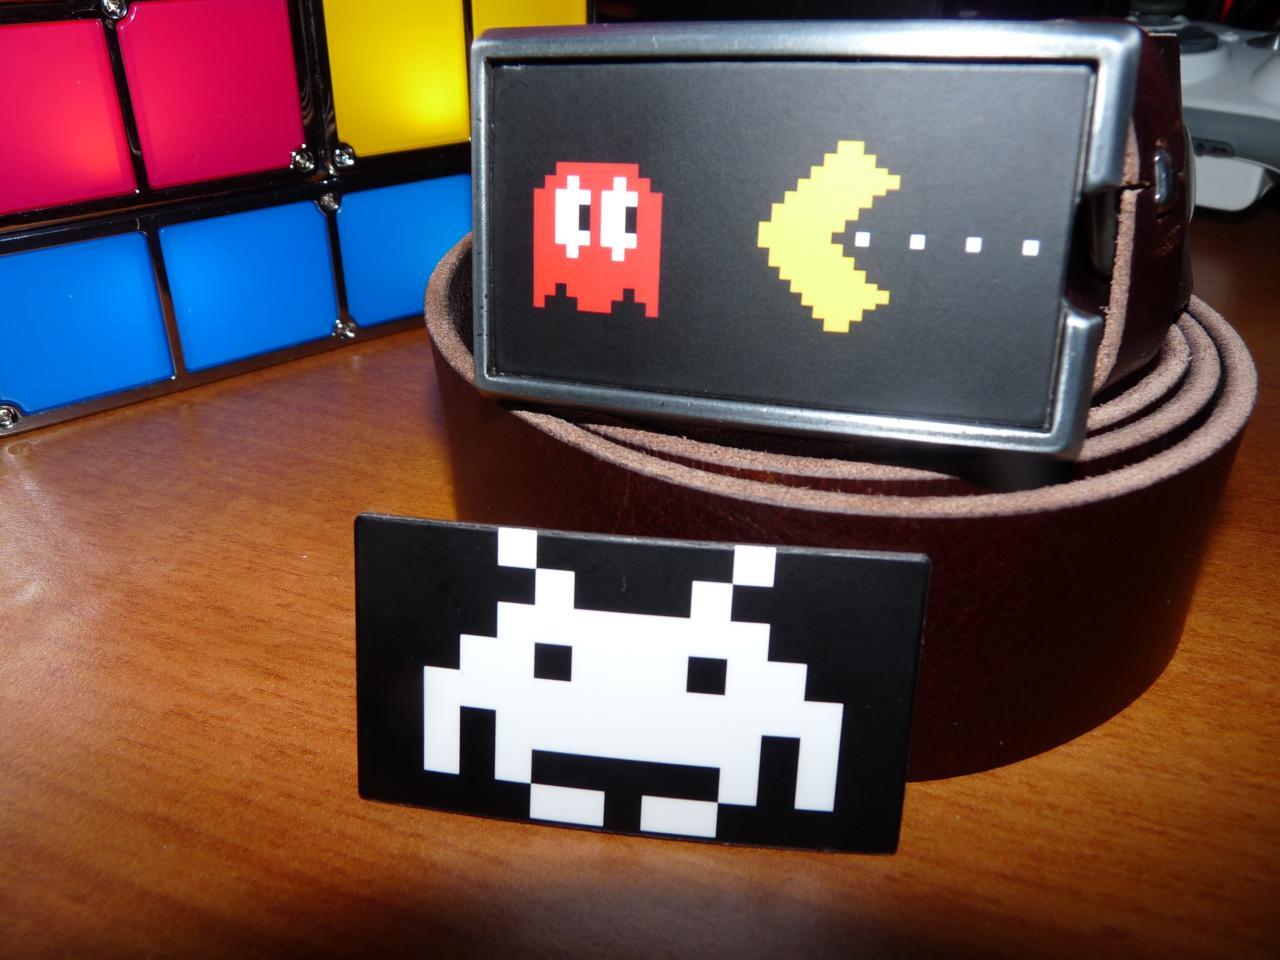 Zwei Motive sind im Preis inklusive. (Foto: GamingGadgets.de)